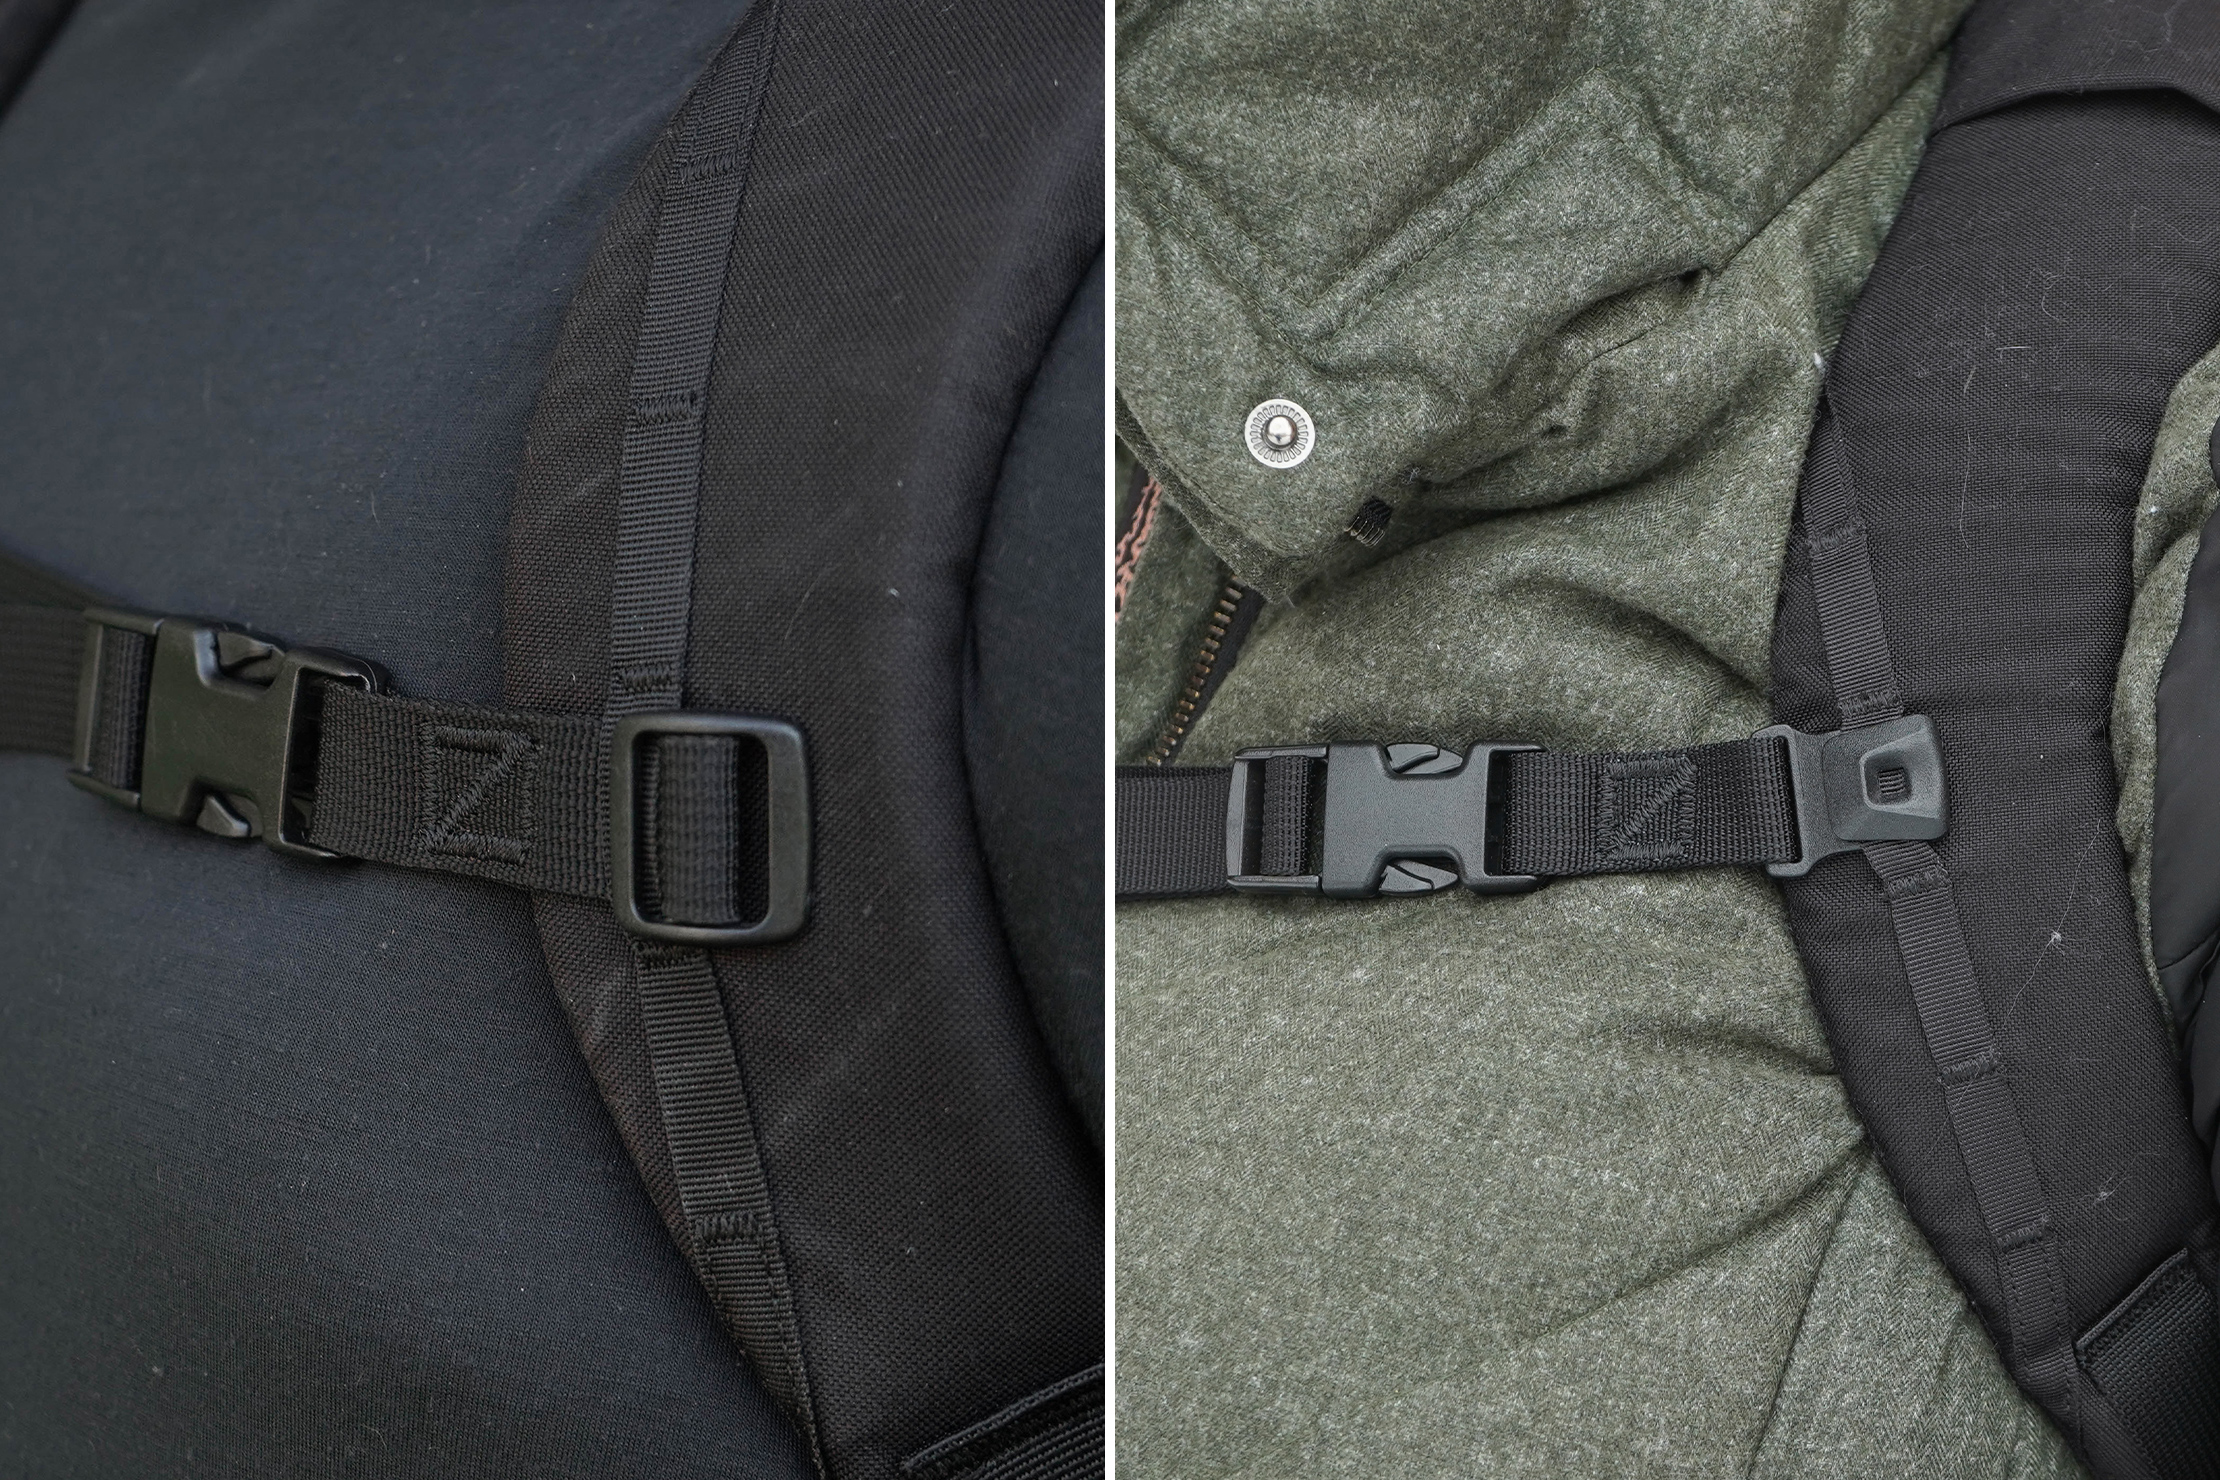 EVERGOODS CHZ22 (left) vs CHZ26 sternum strap (right) comparison